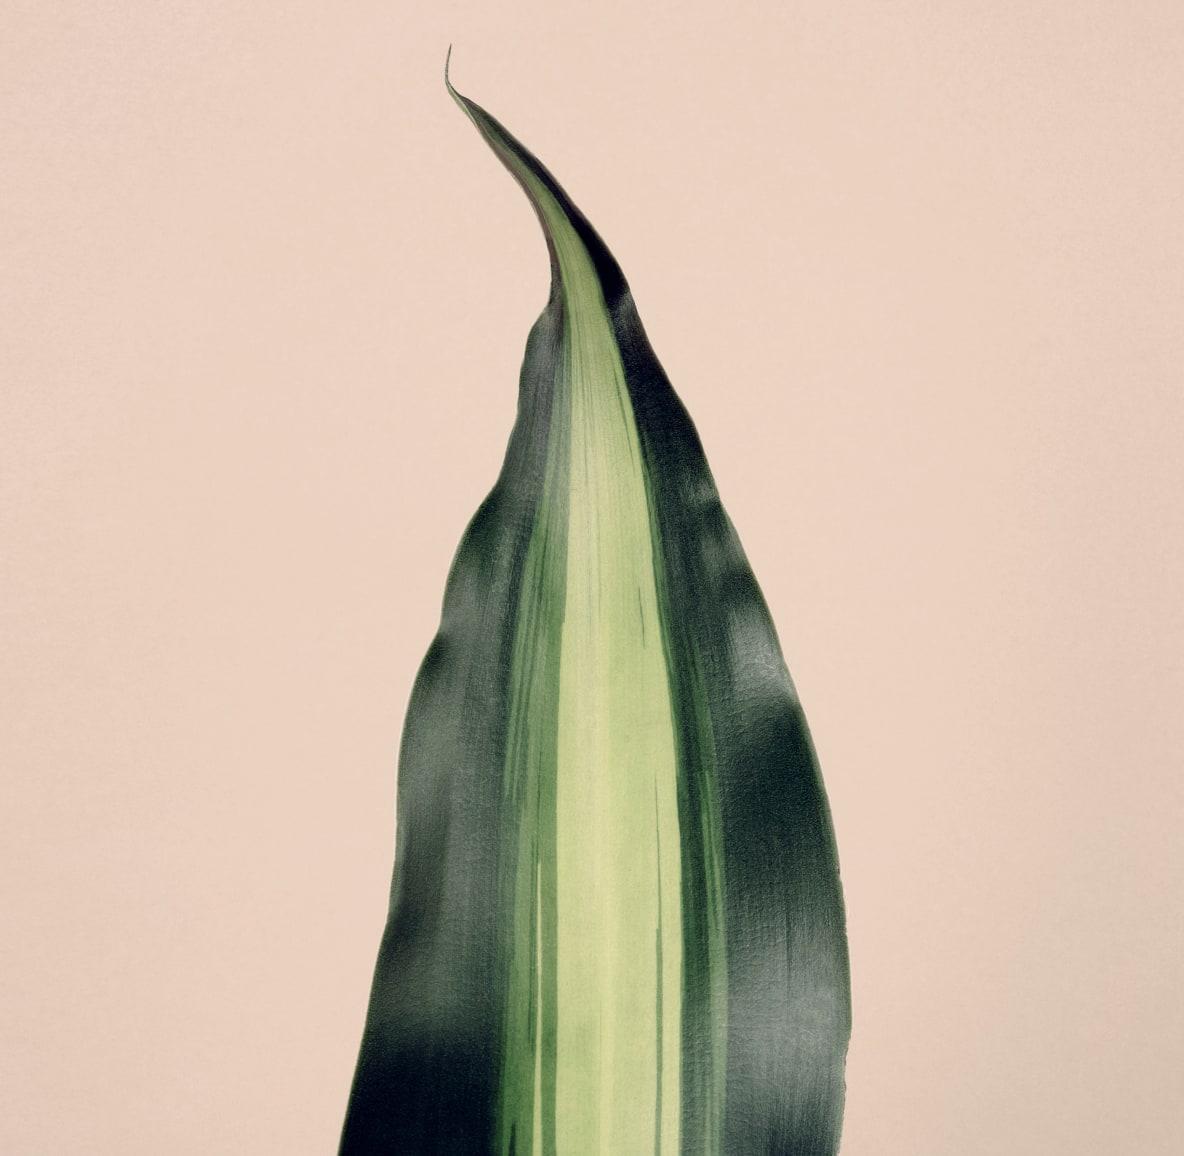 Single leaf of green plant